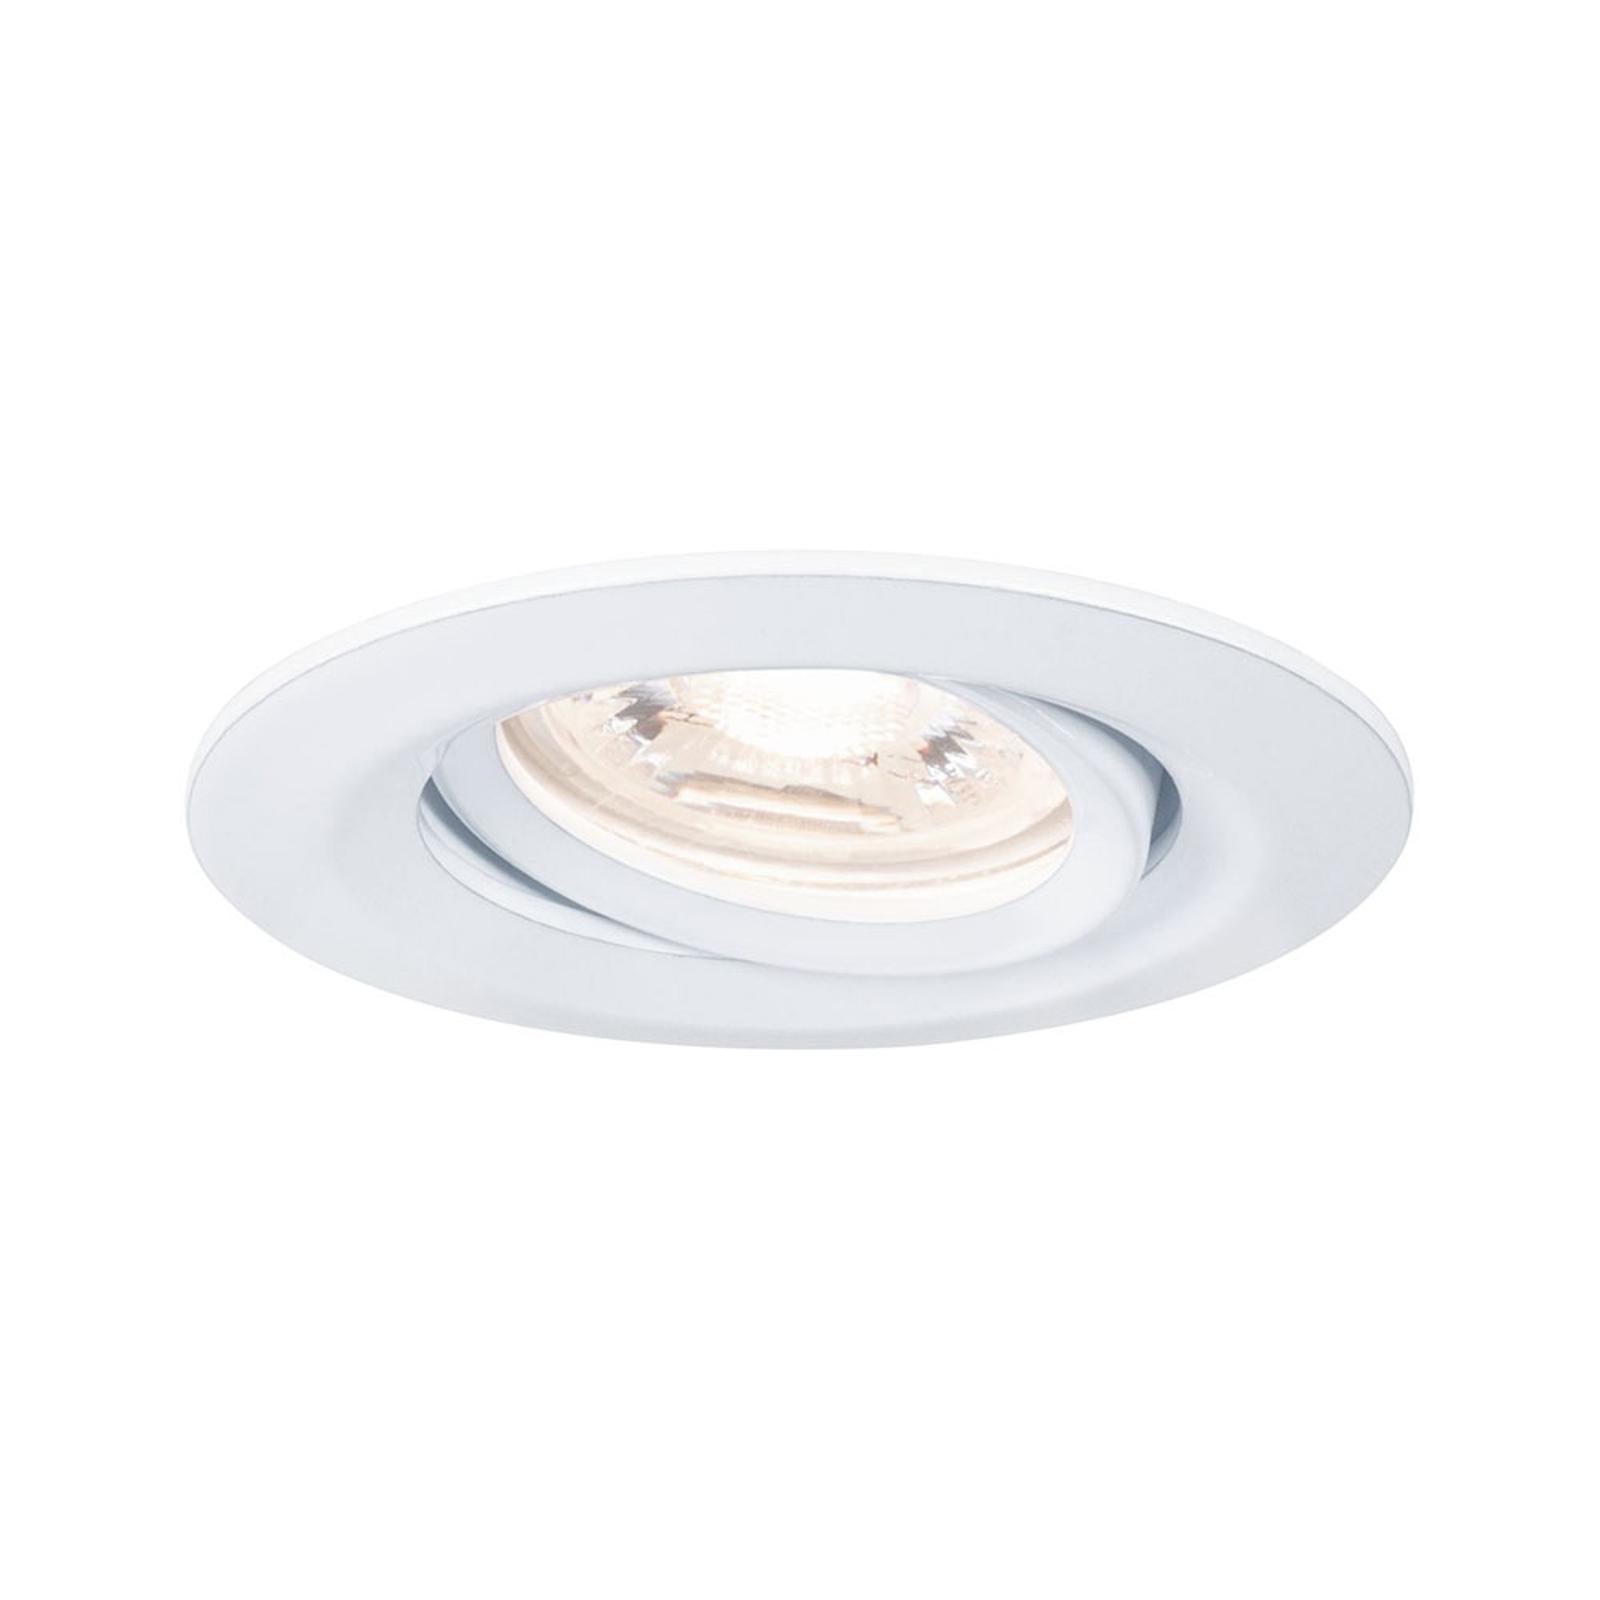 Paulmann Nova mini Plus downlight easydim hvit